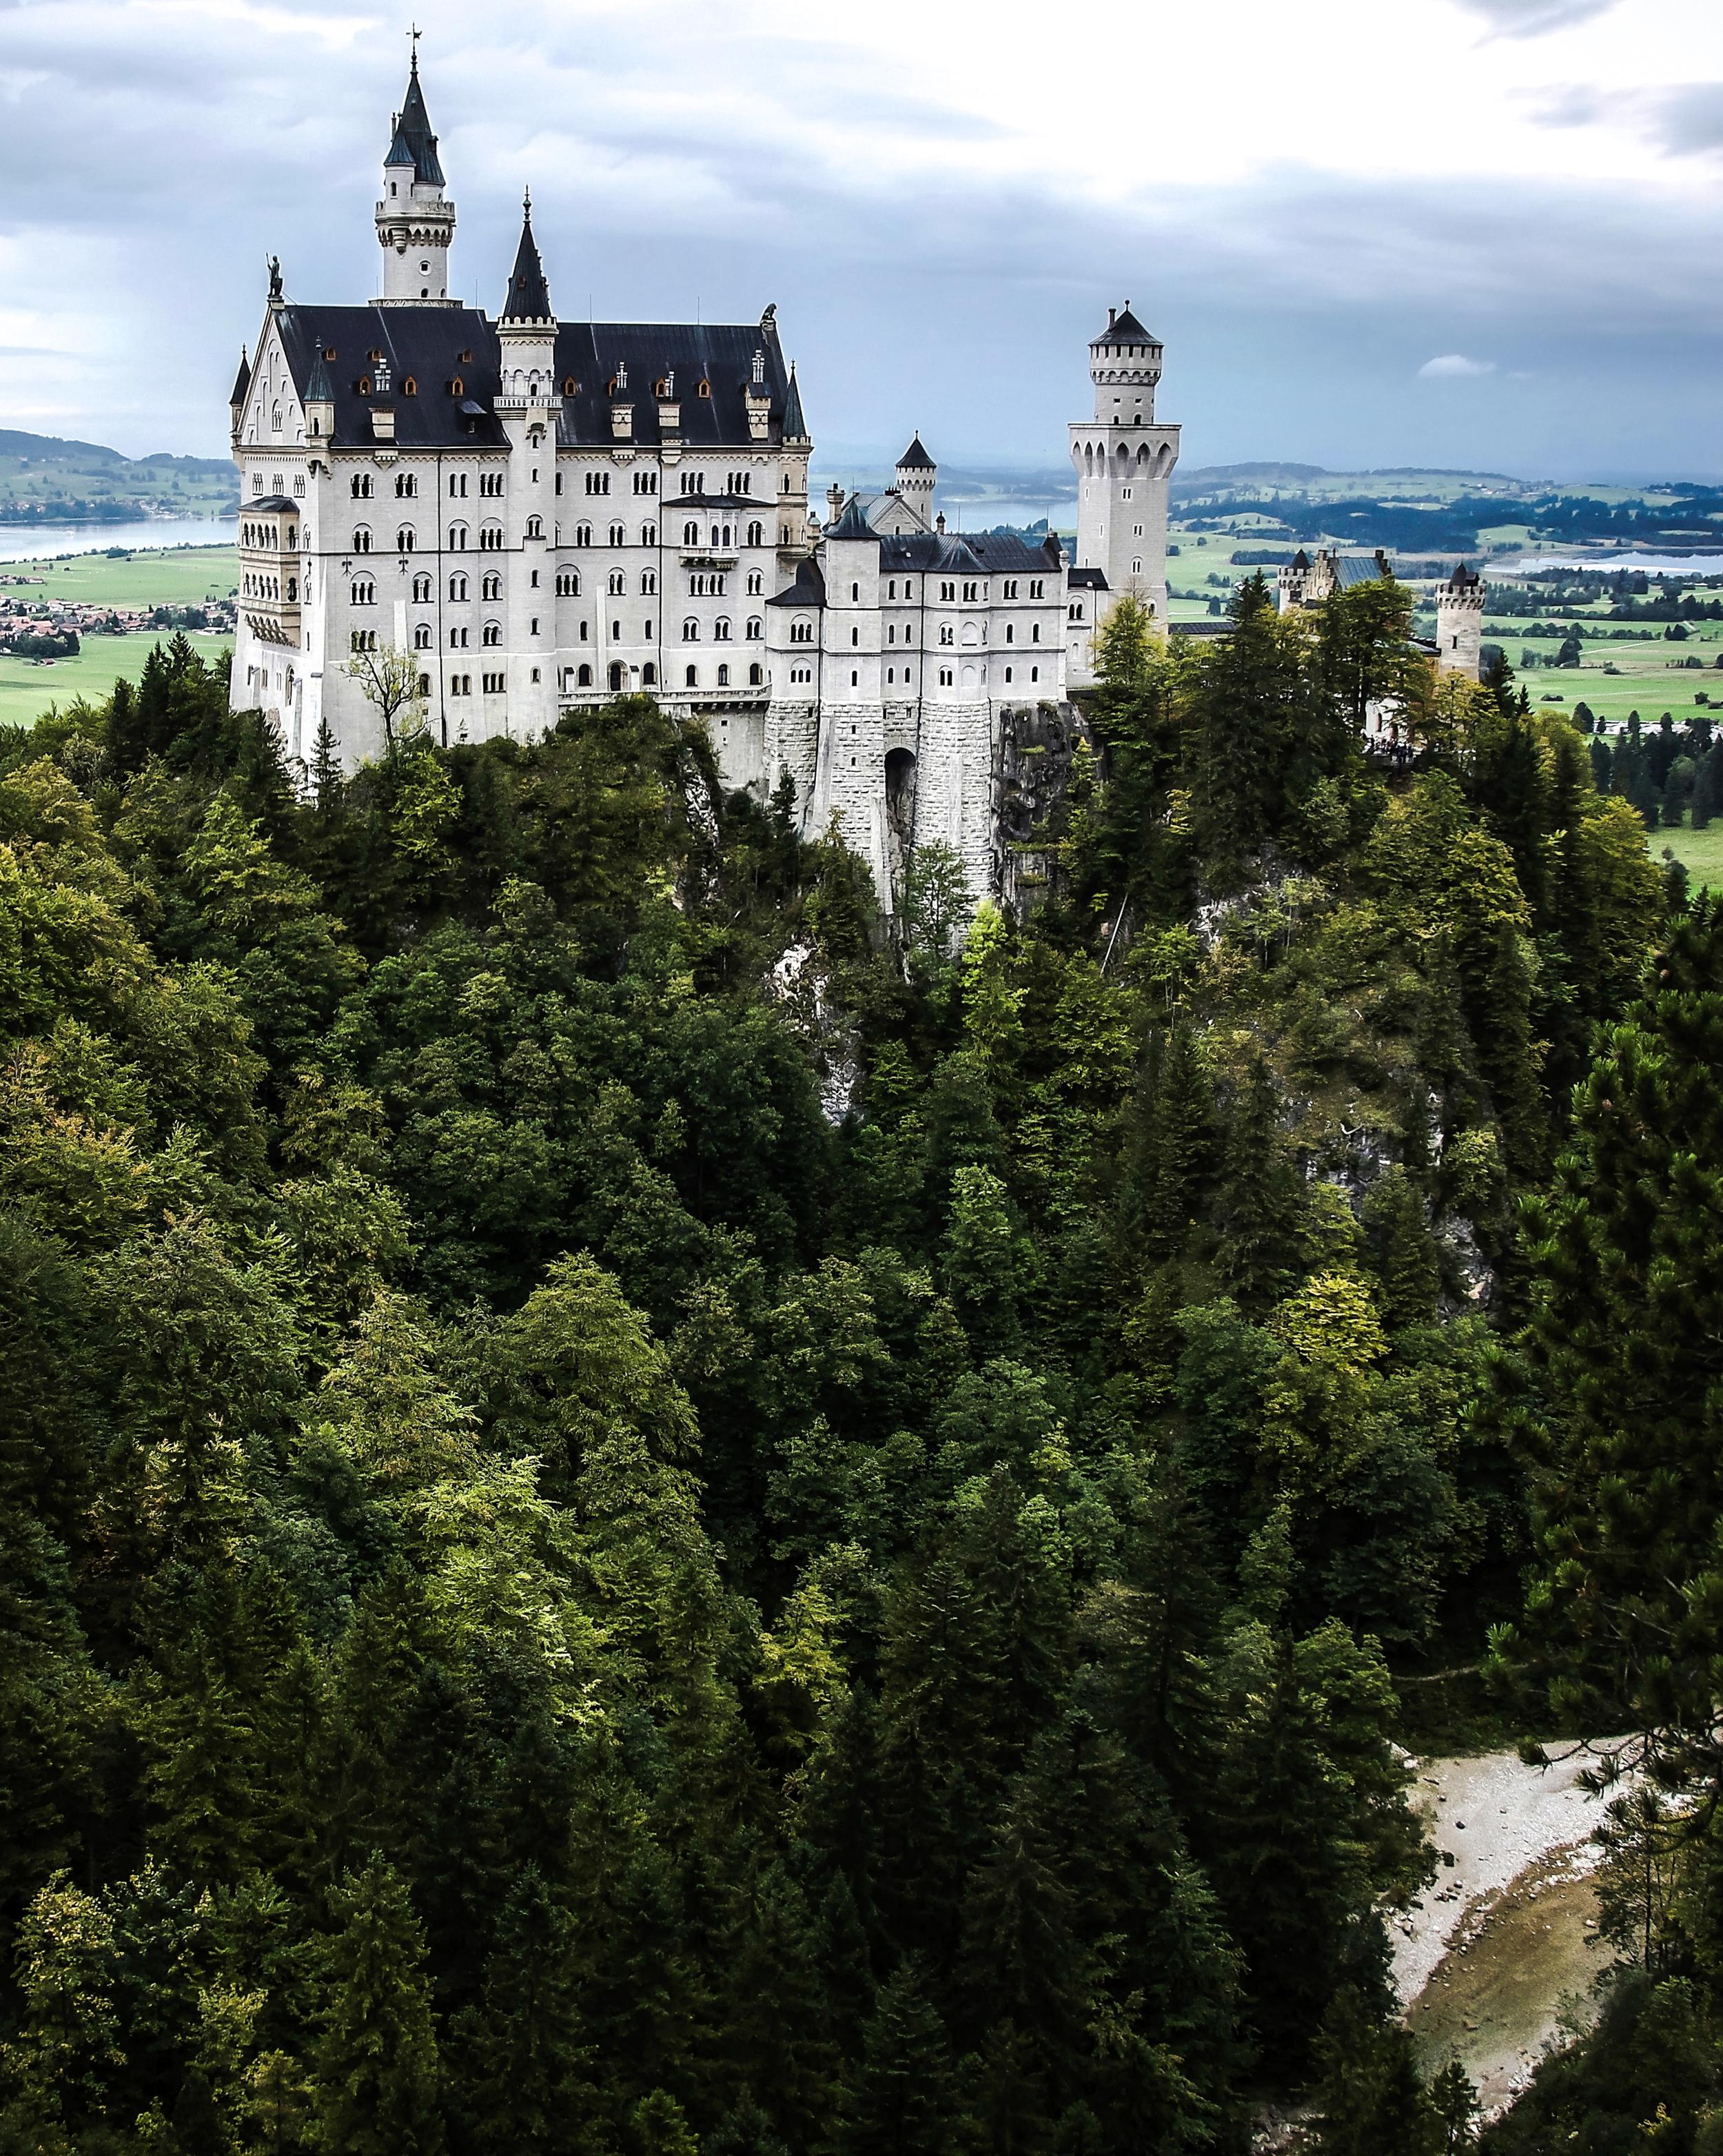 German Fairytale - Neuschwanstein Castle (Germany)